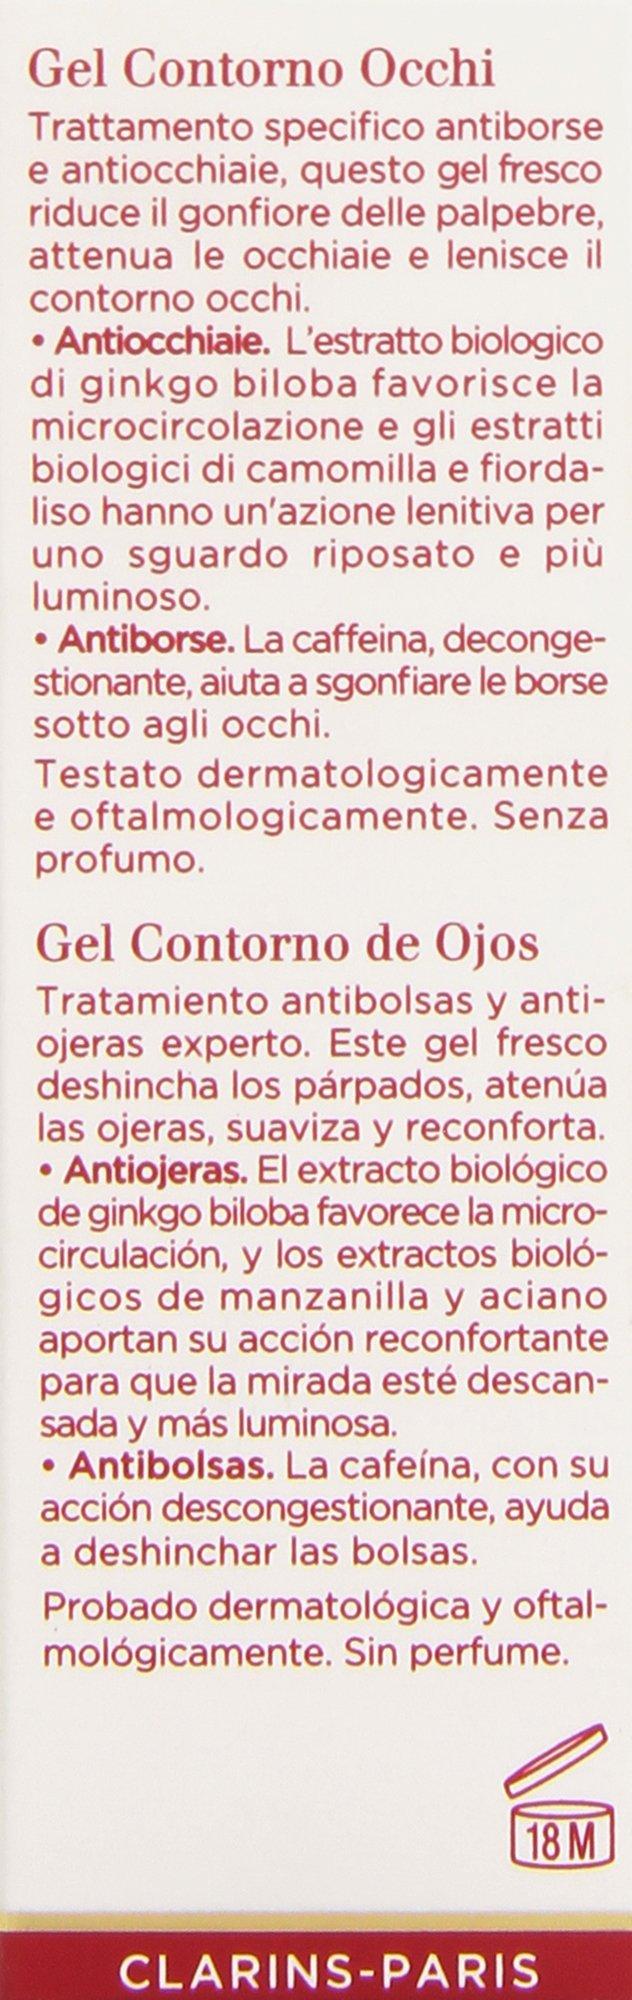 Clarins – Gel contorno de ojos – Antiojeras, Antibolsas – 20 ml